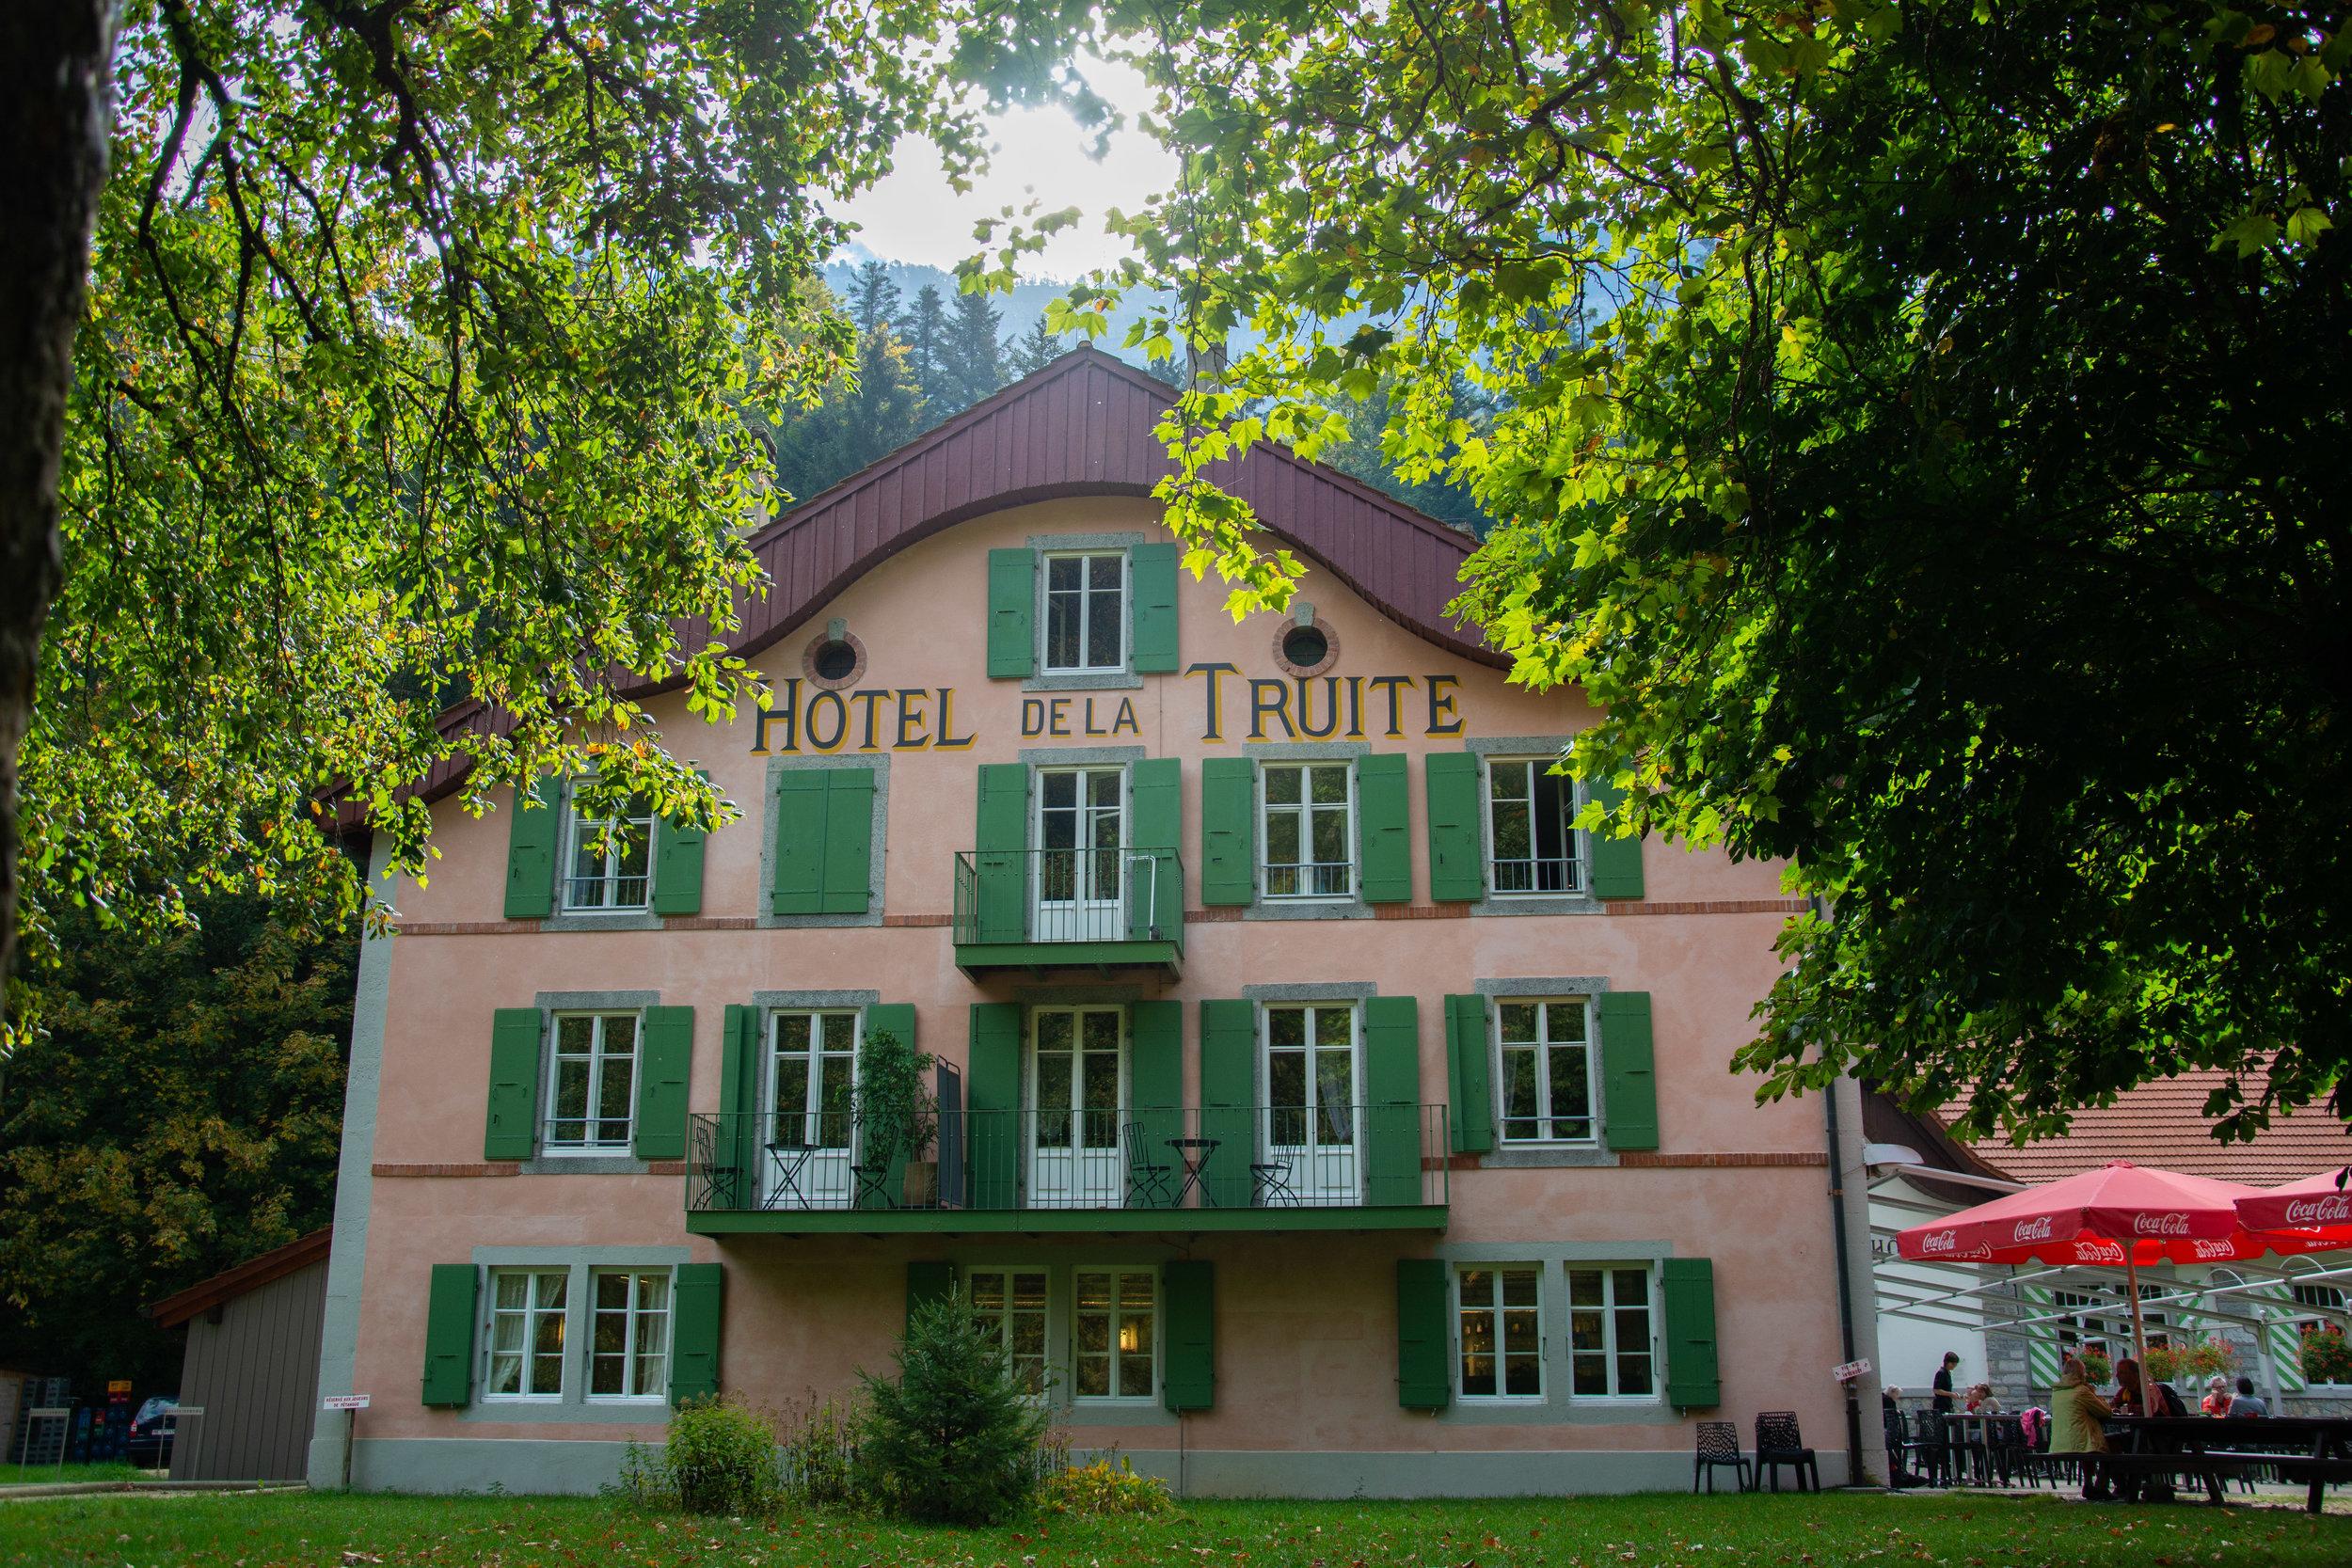 Hotel de la Truite